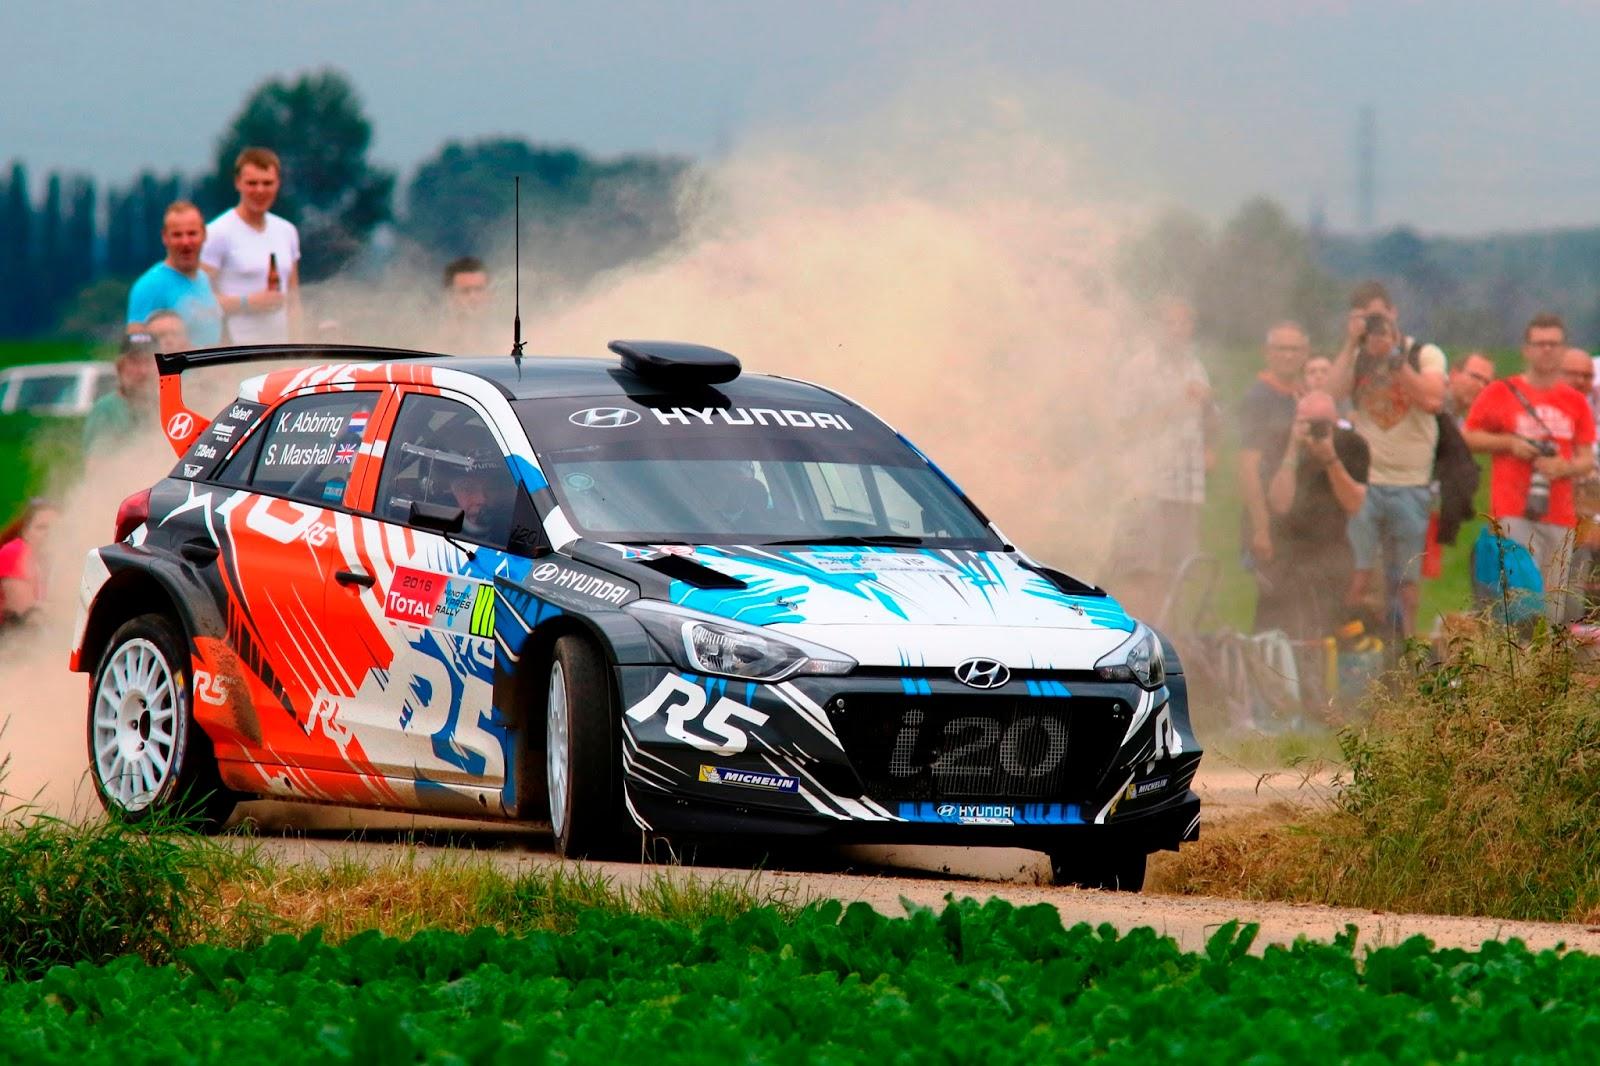 rally ypres i29 r5 1 Η Hyundai Motorsport έφτιαξε το πρώτο i20 R5 για ιδιώτες και έτρεξε στο Ypres Rally Hyundai, Hyundai i20, Hyundai i20 R5, Rally